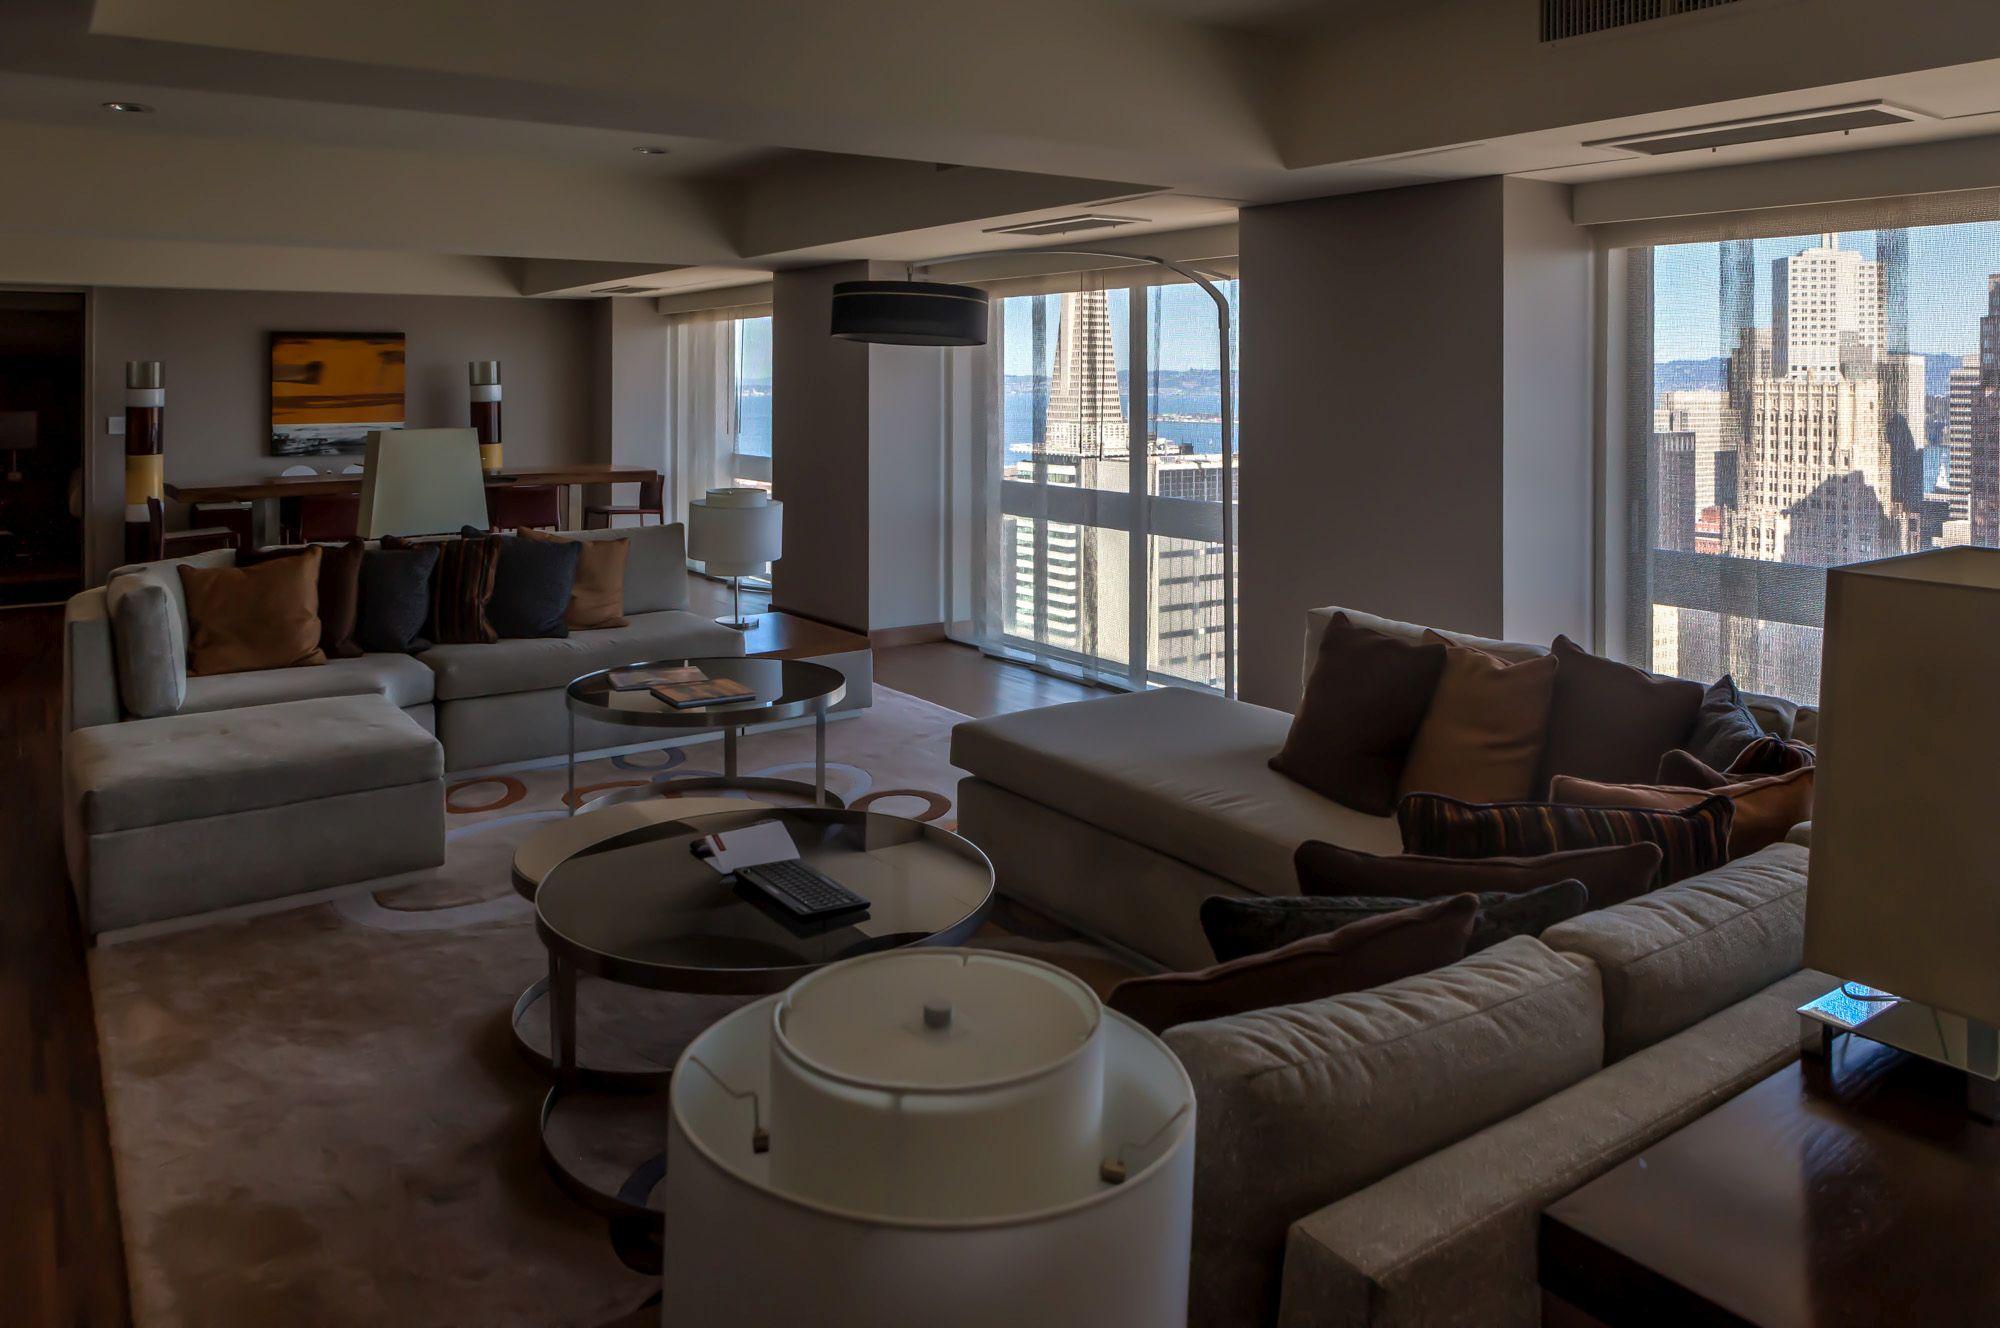 Hotel Review: Grand Hyatt San Francisco – Premier Suite